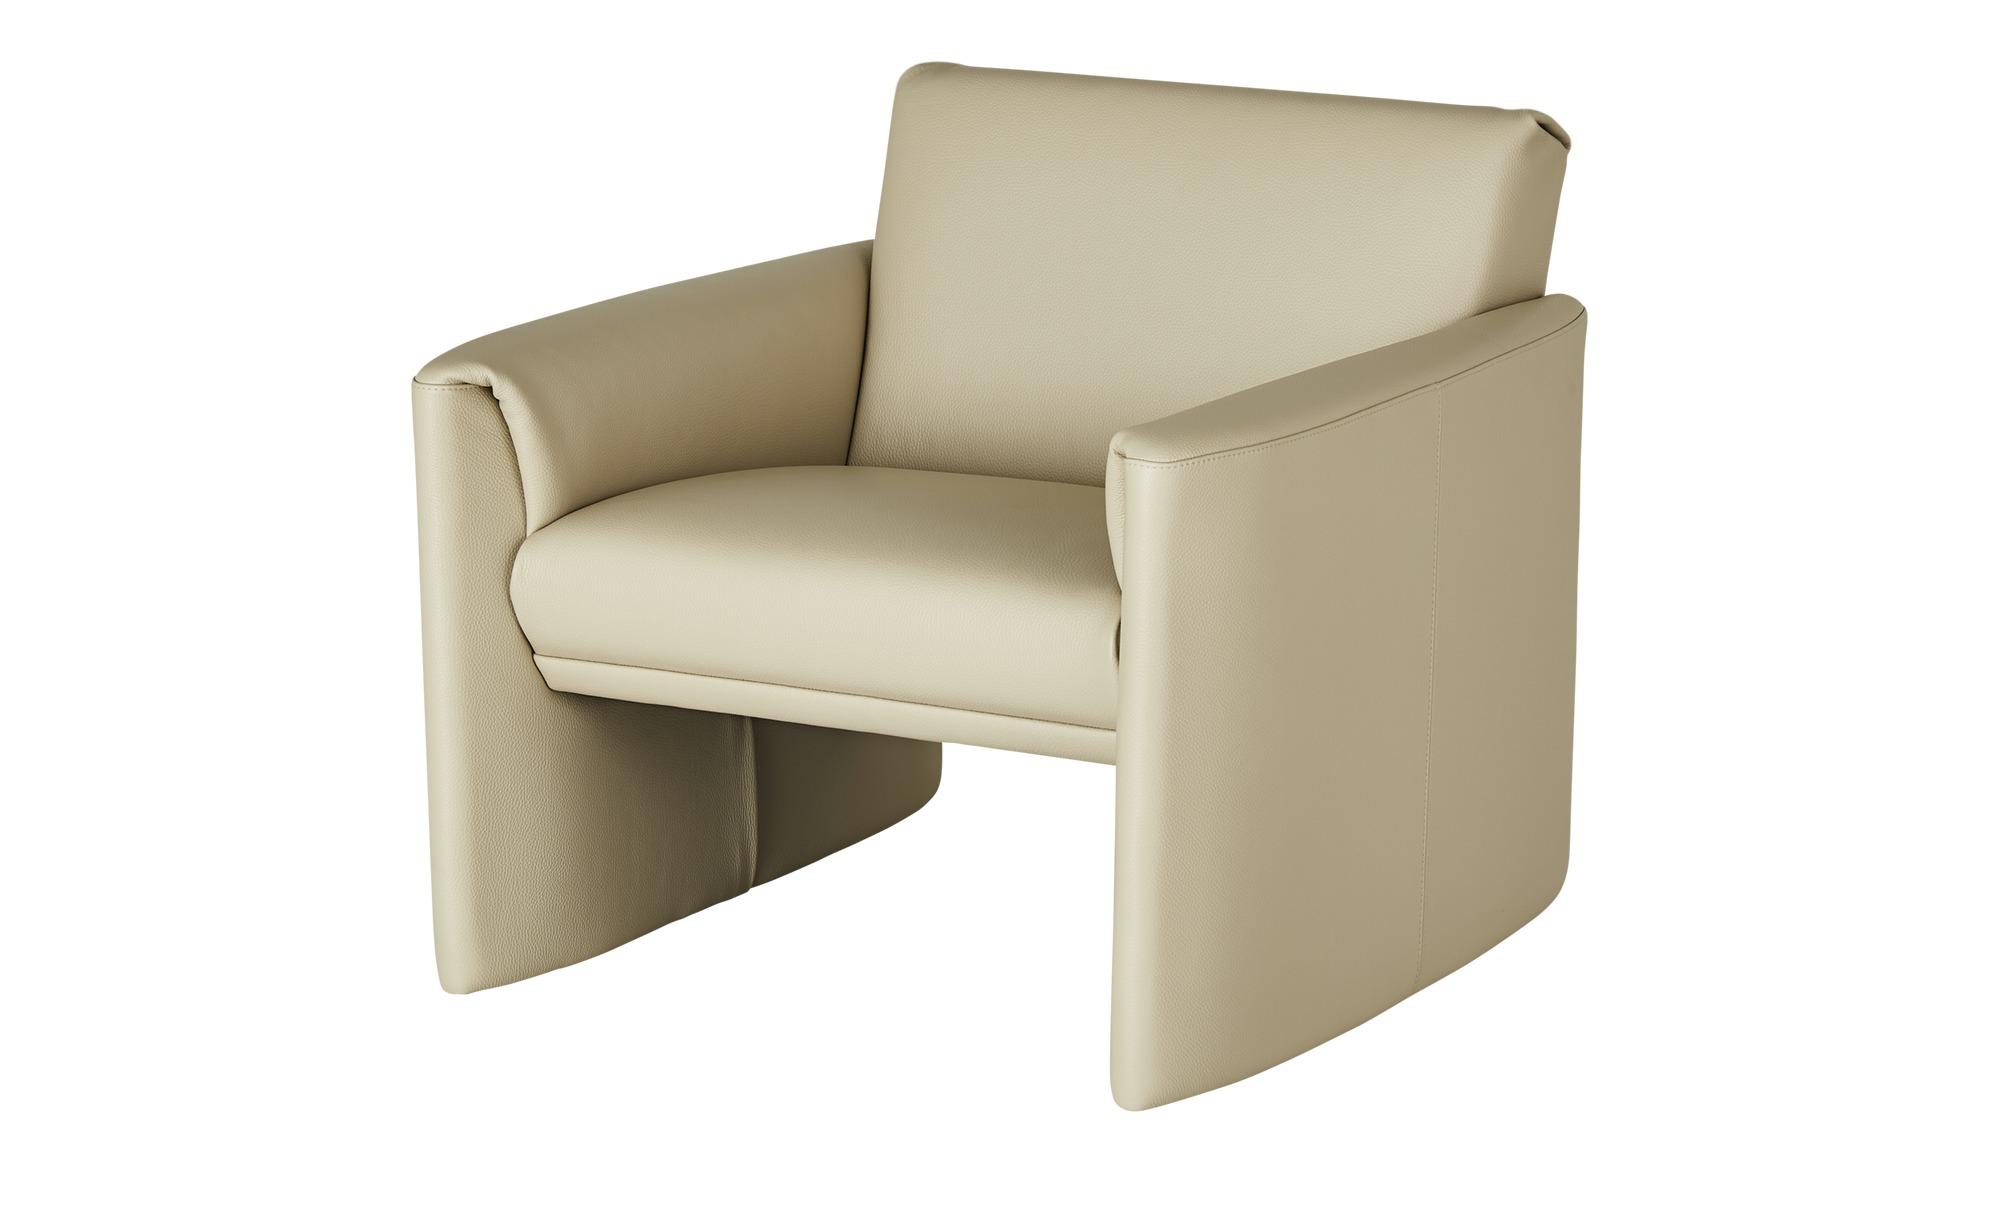 Ledersessel, niedrig  Boavista ¦ creme ¦ Maße (cm): B: 83 H: 73 T: 86 Polstermöbel > Sessel > Ledersessel - Höffner